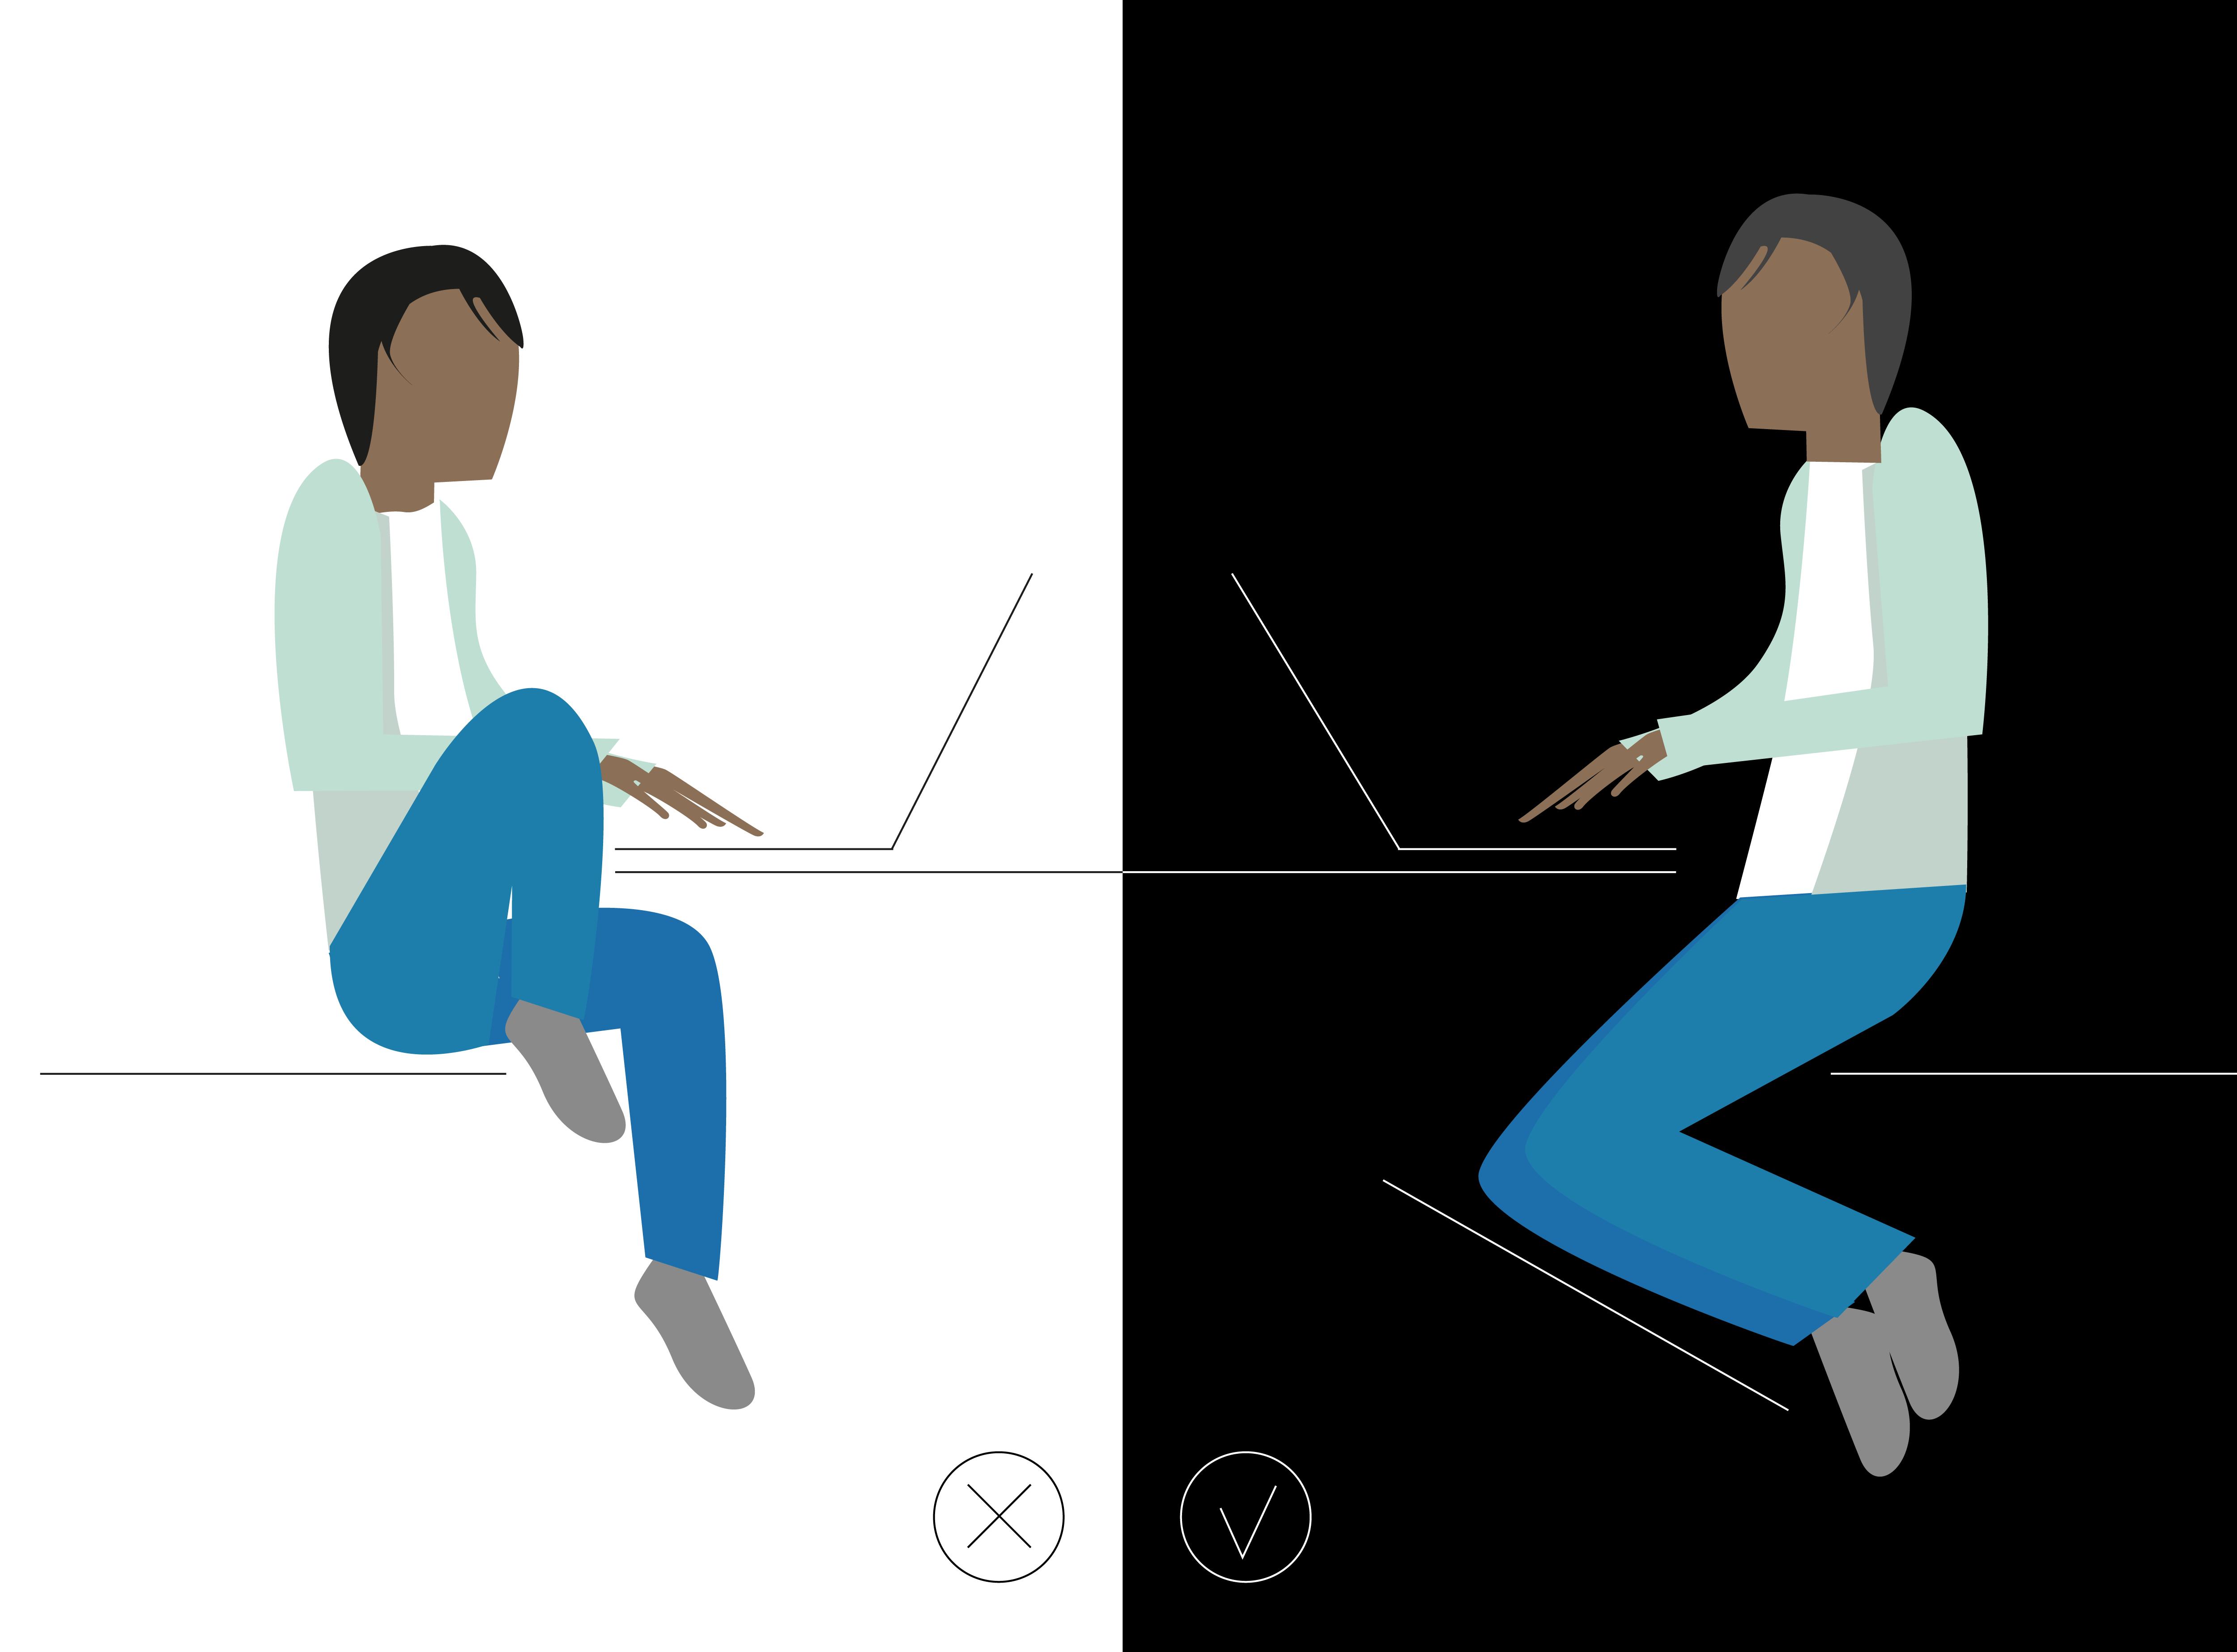 travailler assis sans avoir mal au dos kamasutra jobasutra workasutra illustration par charlie la freelance